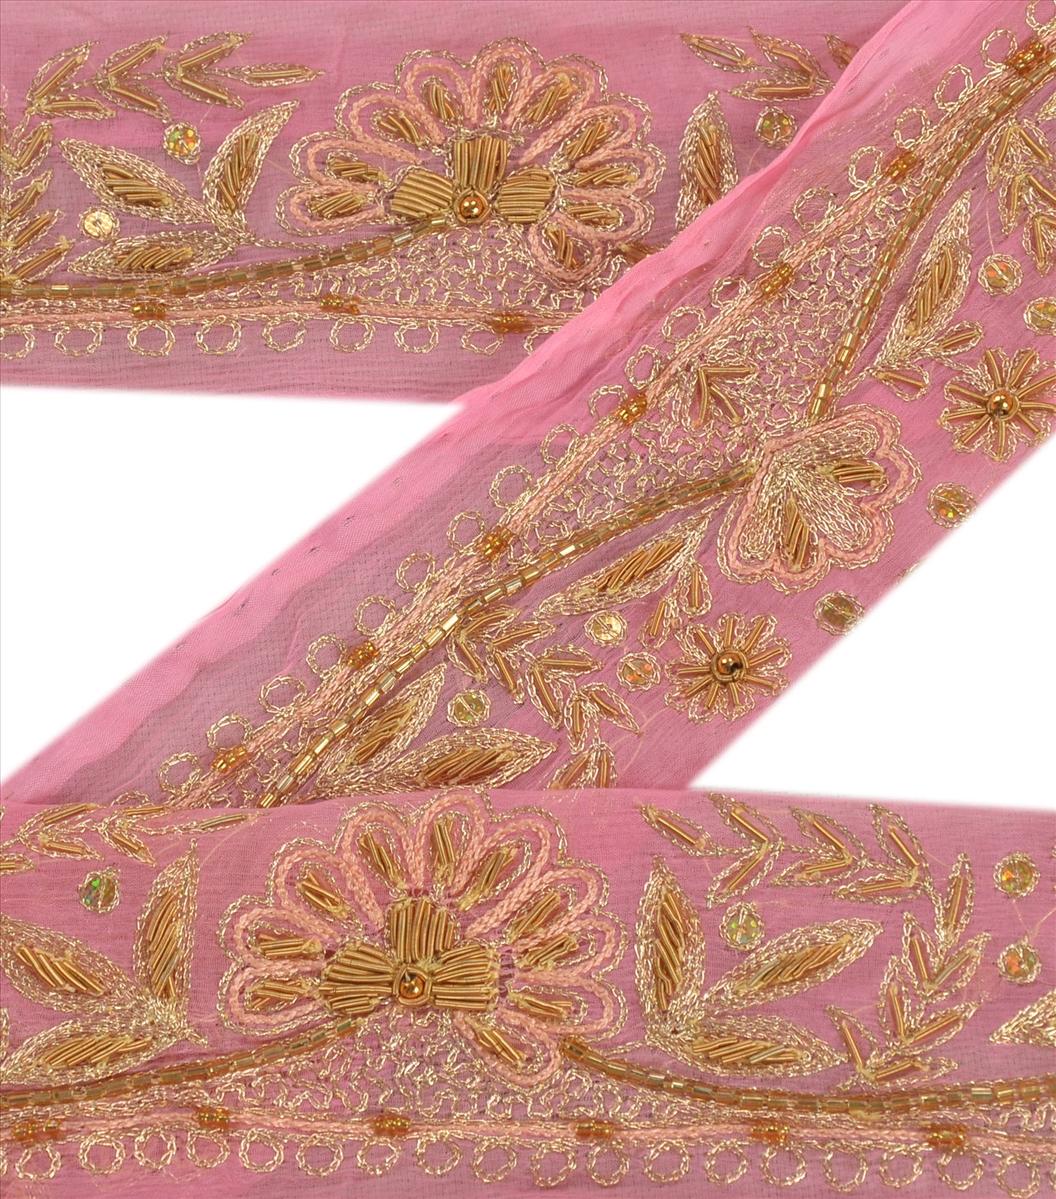 Antique Vtg Sari Border Indian Craft Trim Embroidered Beaded Pink Lace Ribbon